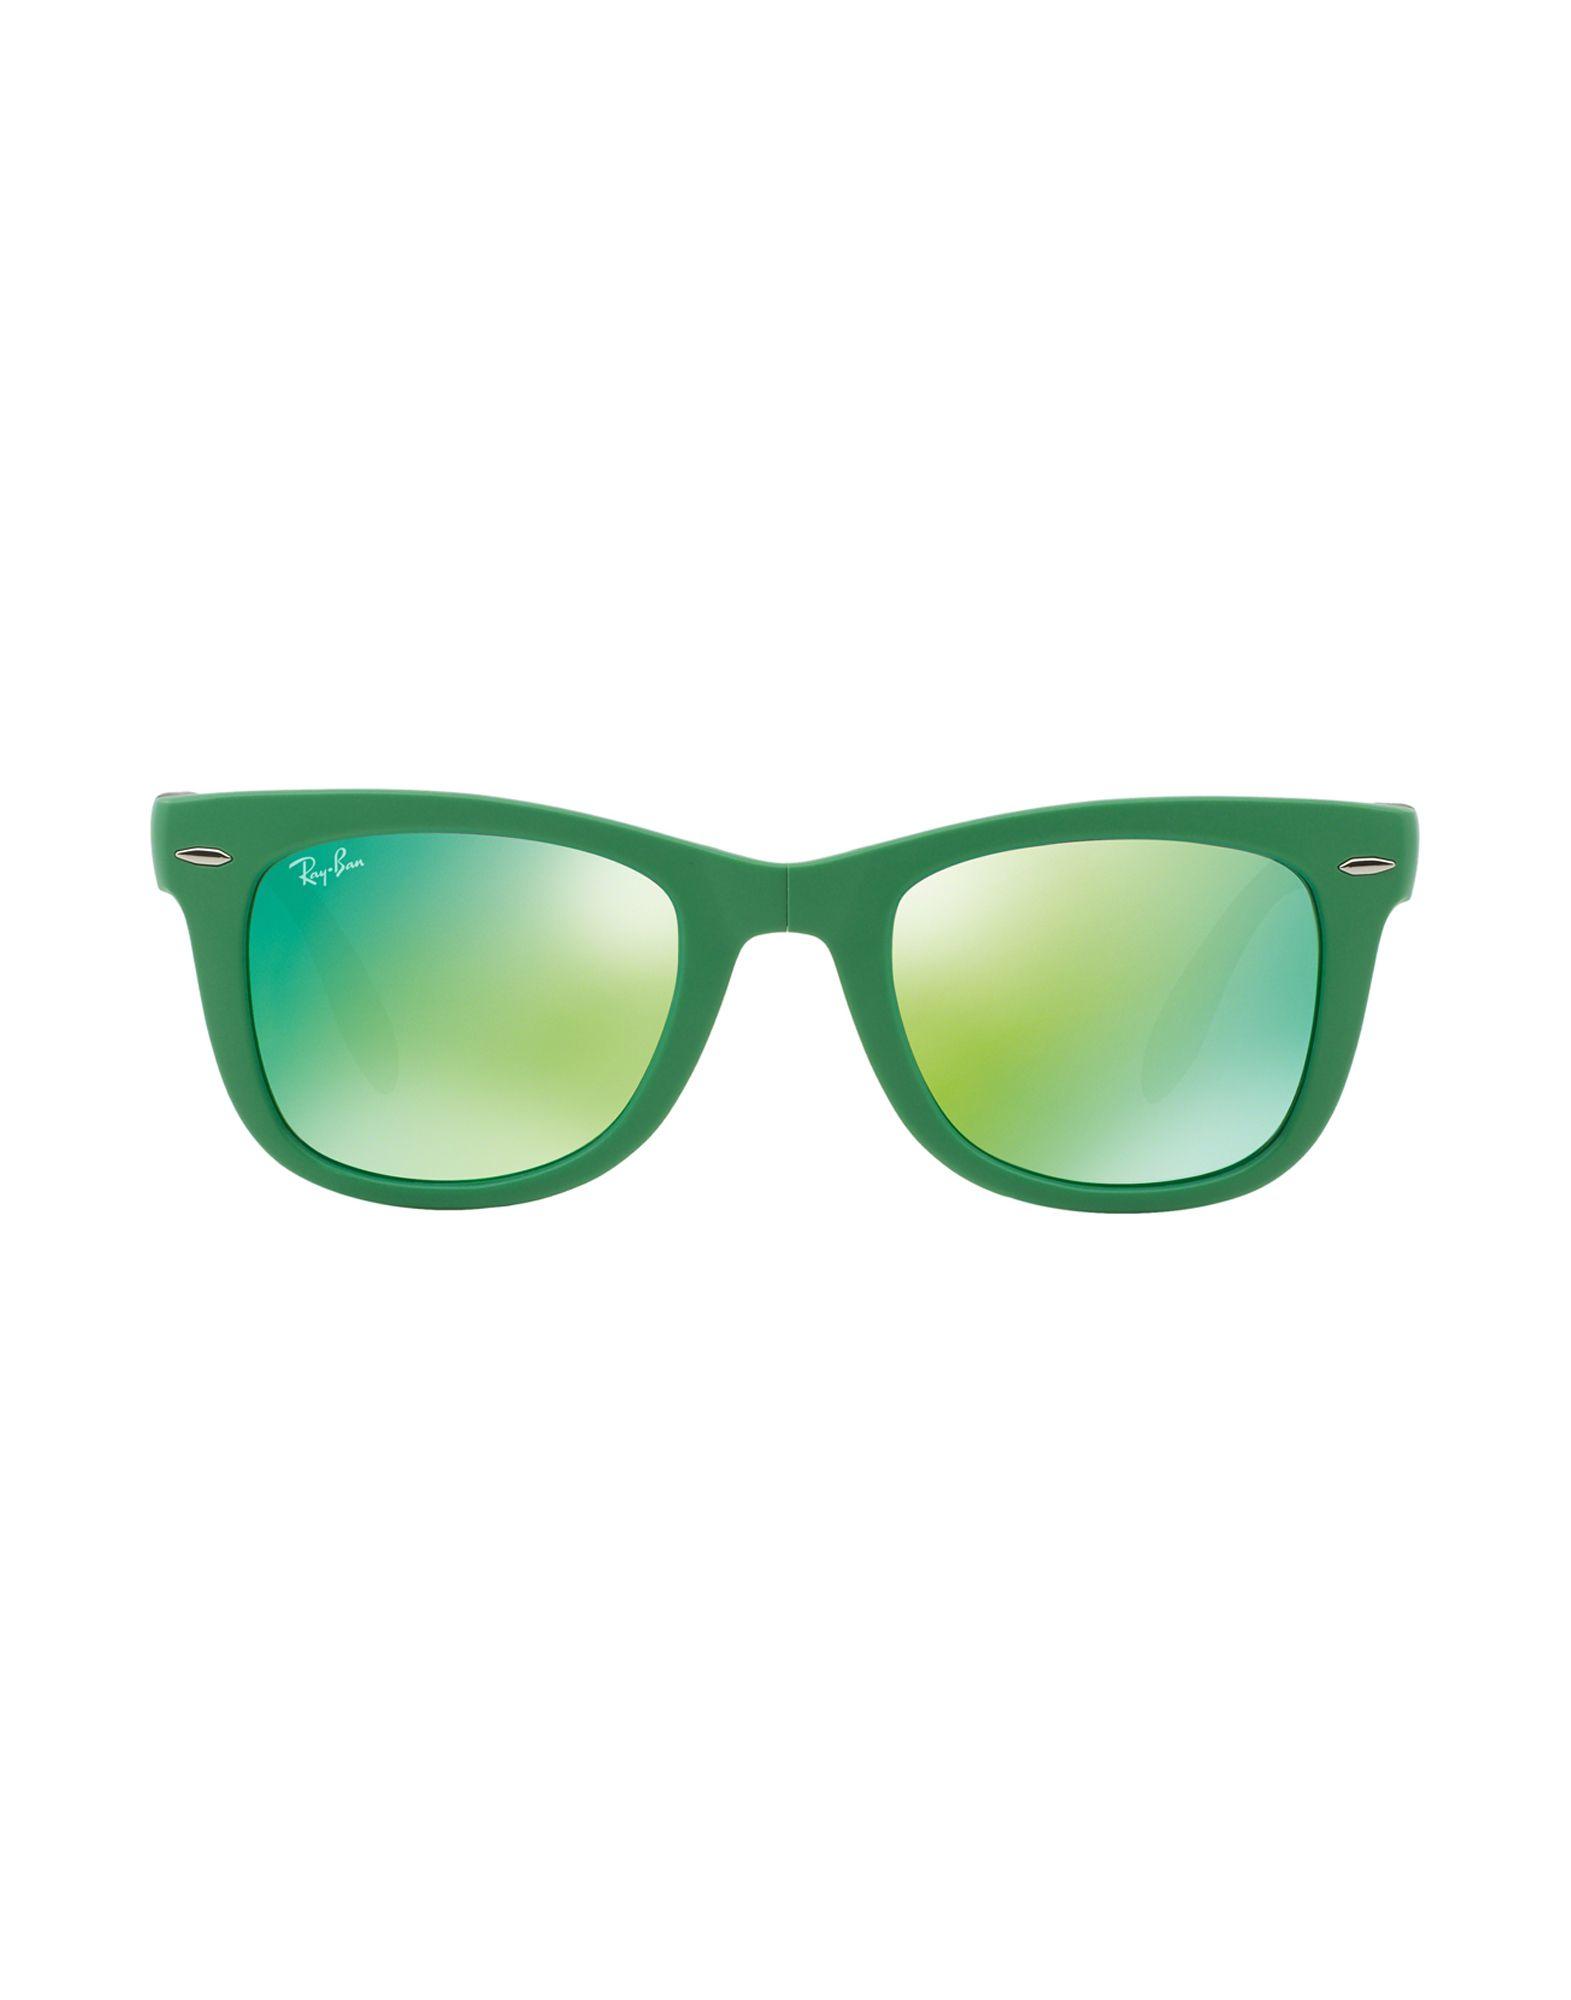 0405ac791d Green Ray Ban Sunglasses